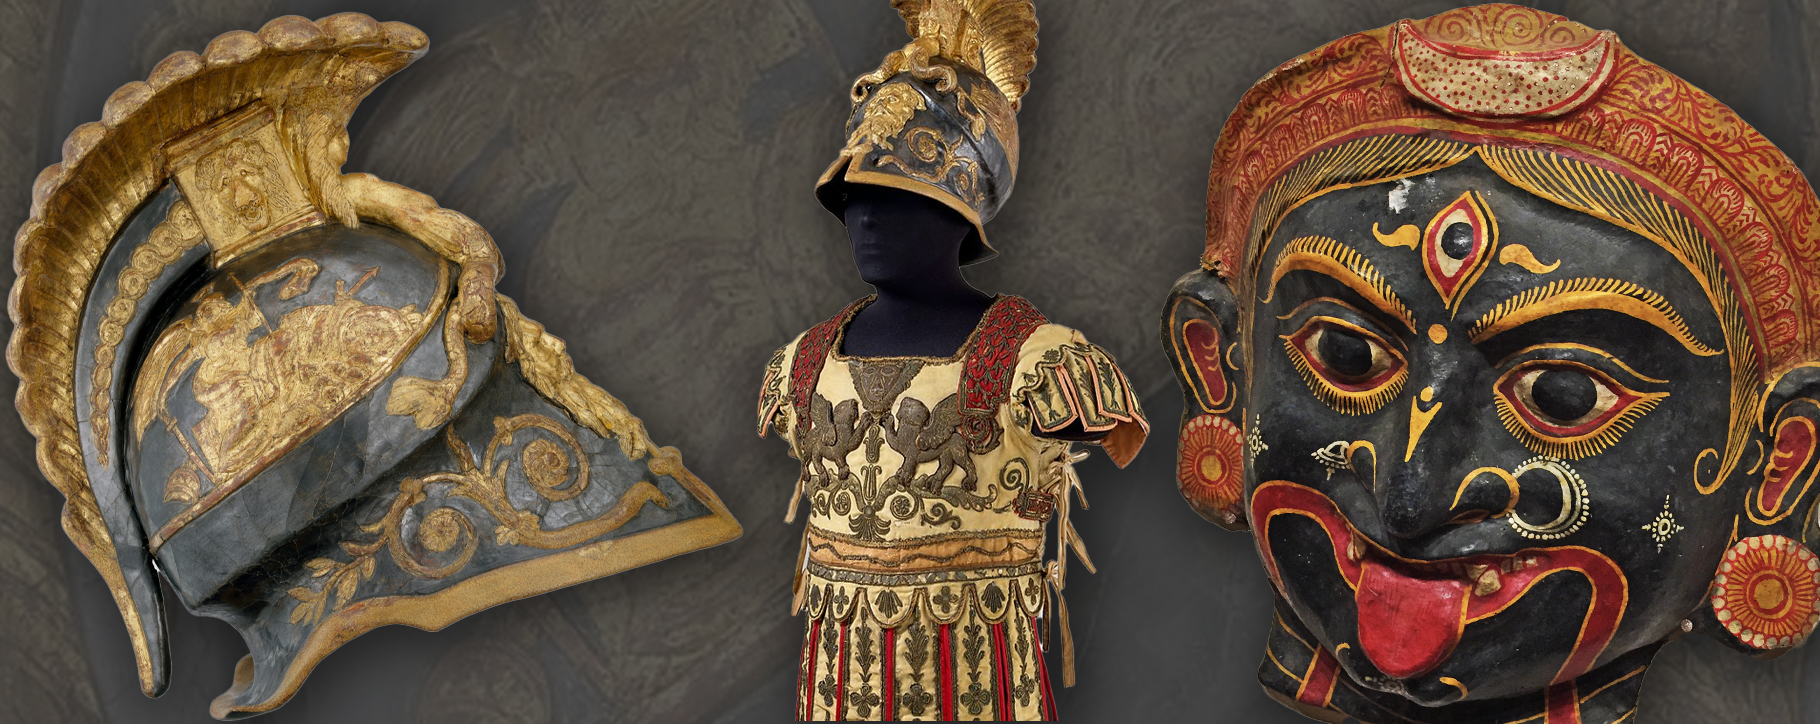 Papier Mache Mask Costume